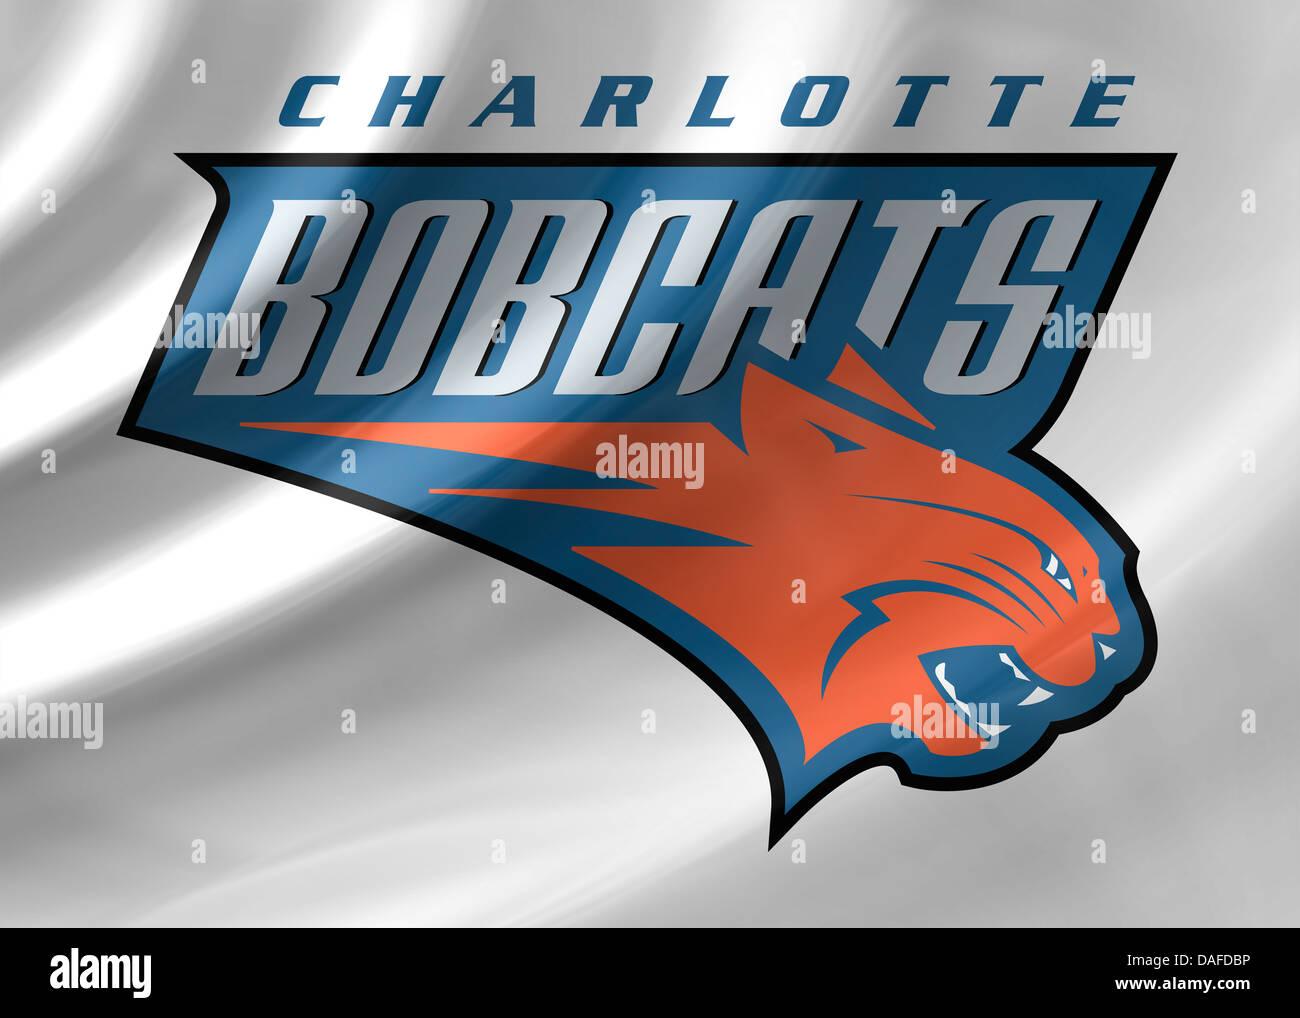 Charlotte Bobcats Logo Symbol Icon Flag Emblem Stock Photo 58117466